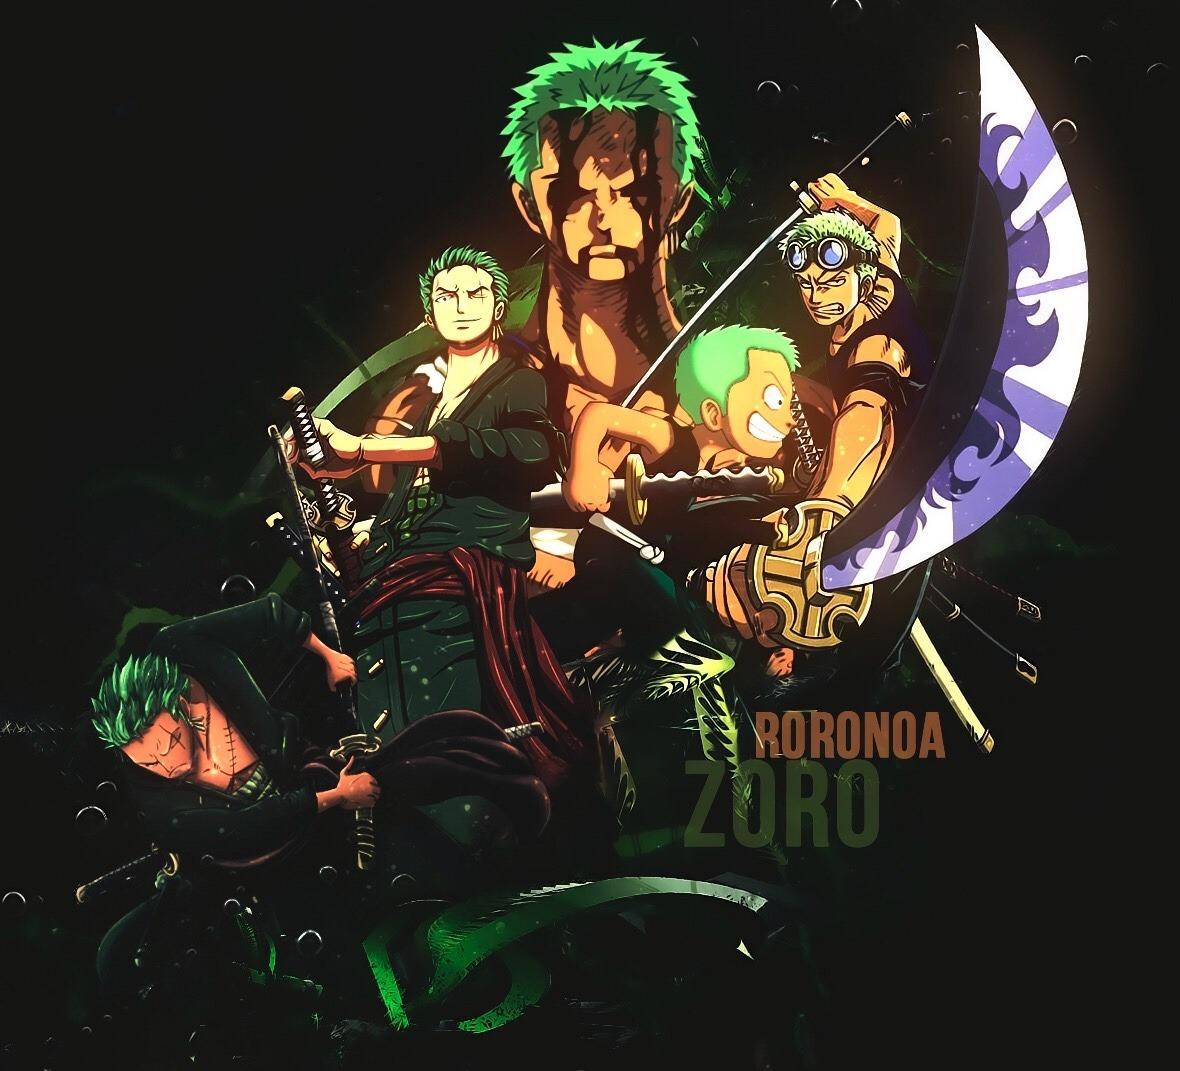 Onepiece Roronoa Zoro Wallpaper Zoro Toy Zoro Wallpaper Hd Android 3052073 Hd Wallpaper Backgrounds Download